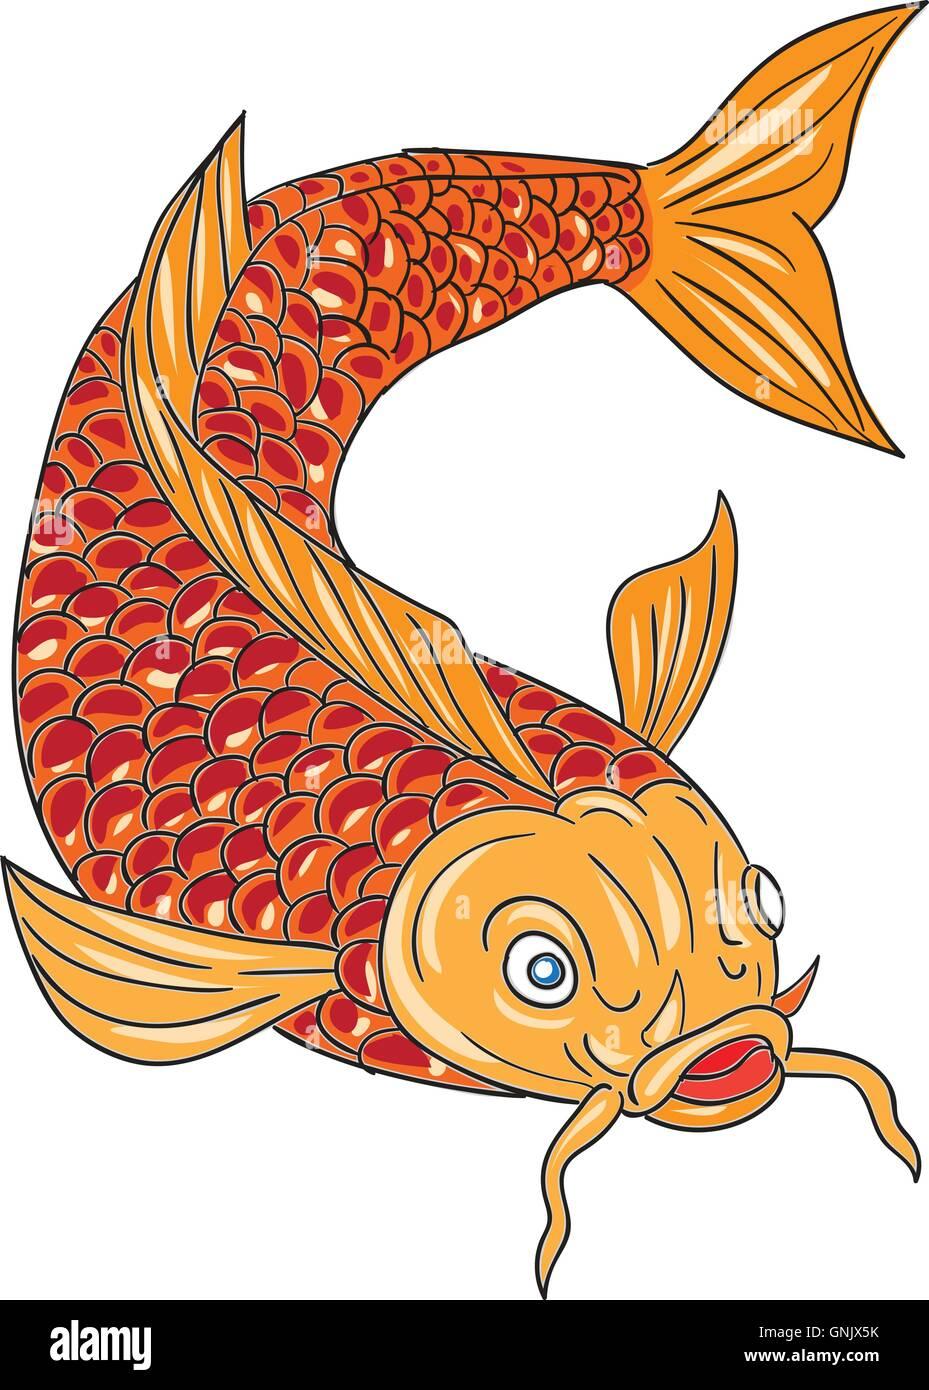 Koi Nishikigoi Carp Fish Swimming Down Drawing Stock Vector Art ...